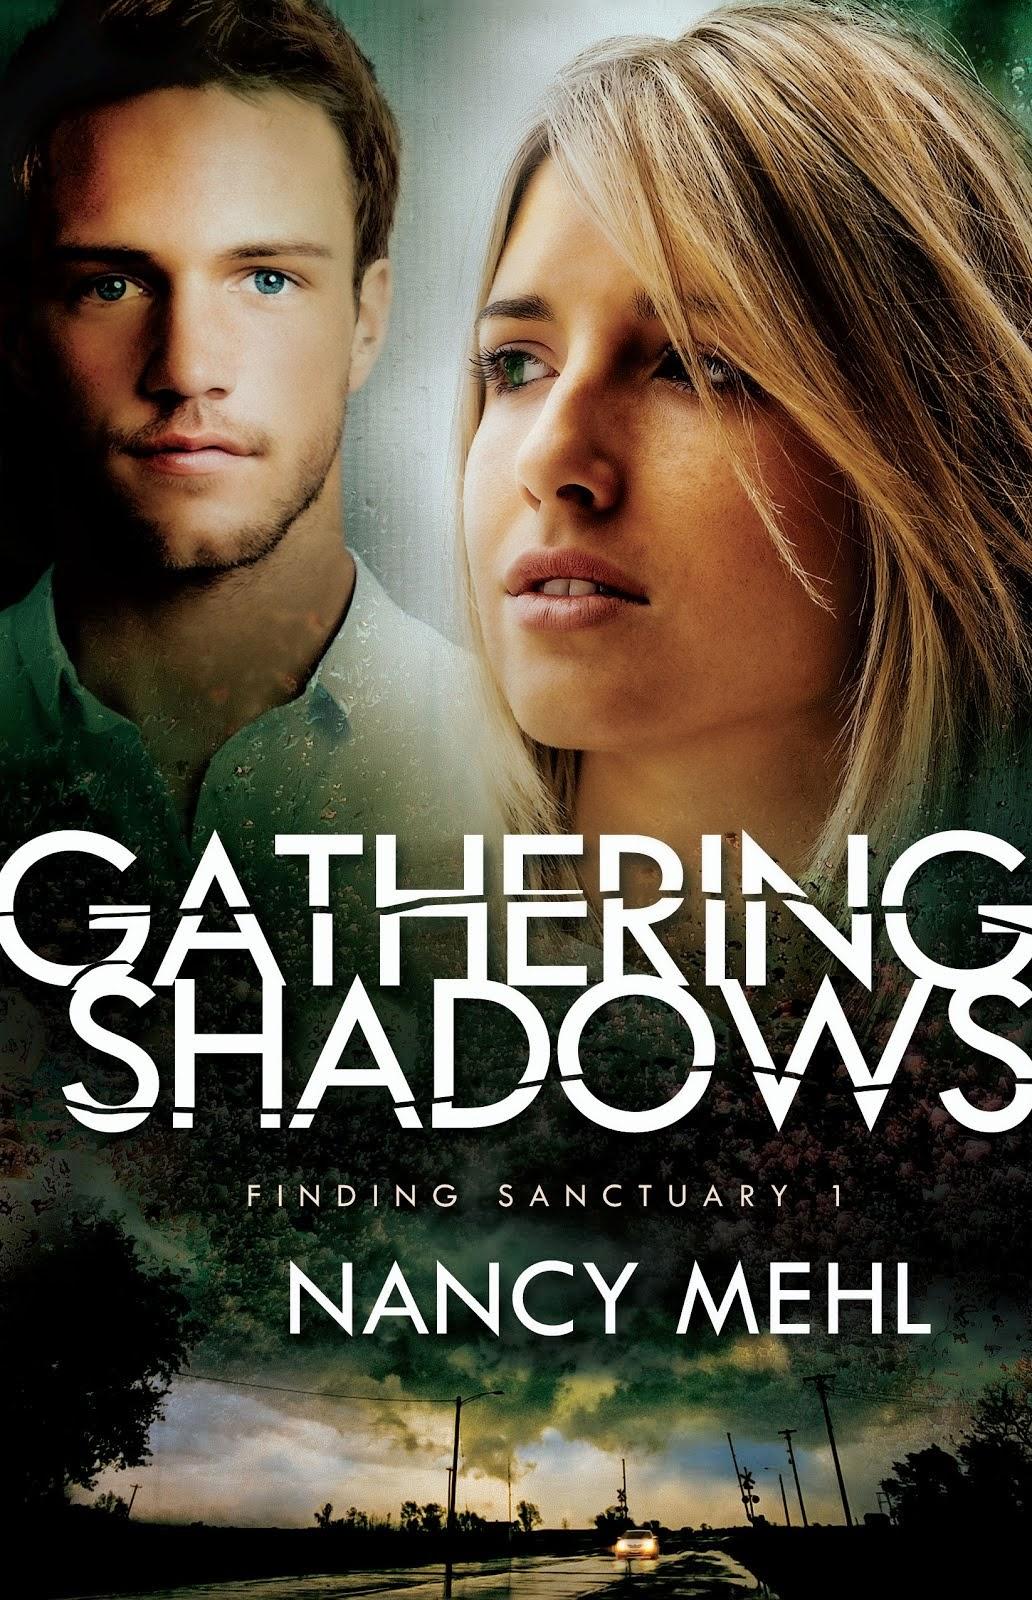 Nancy Mehl's Newest